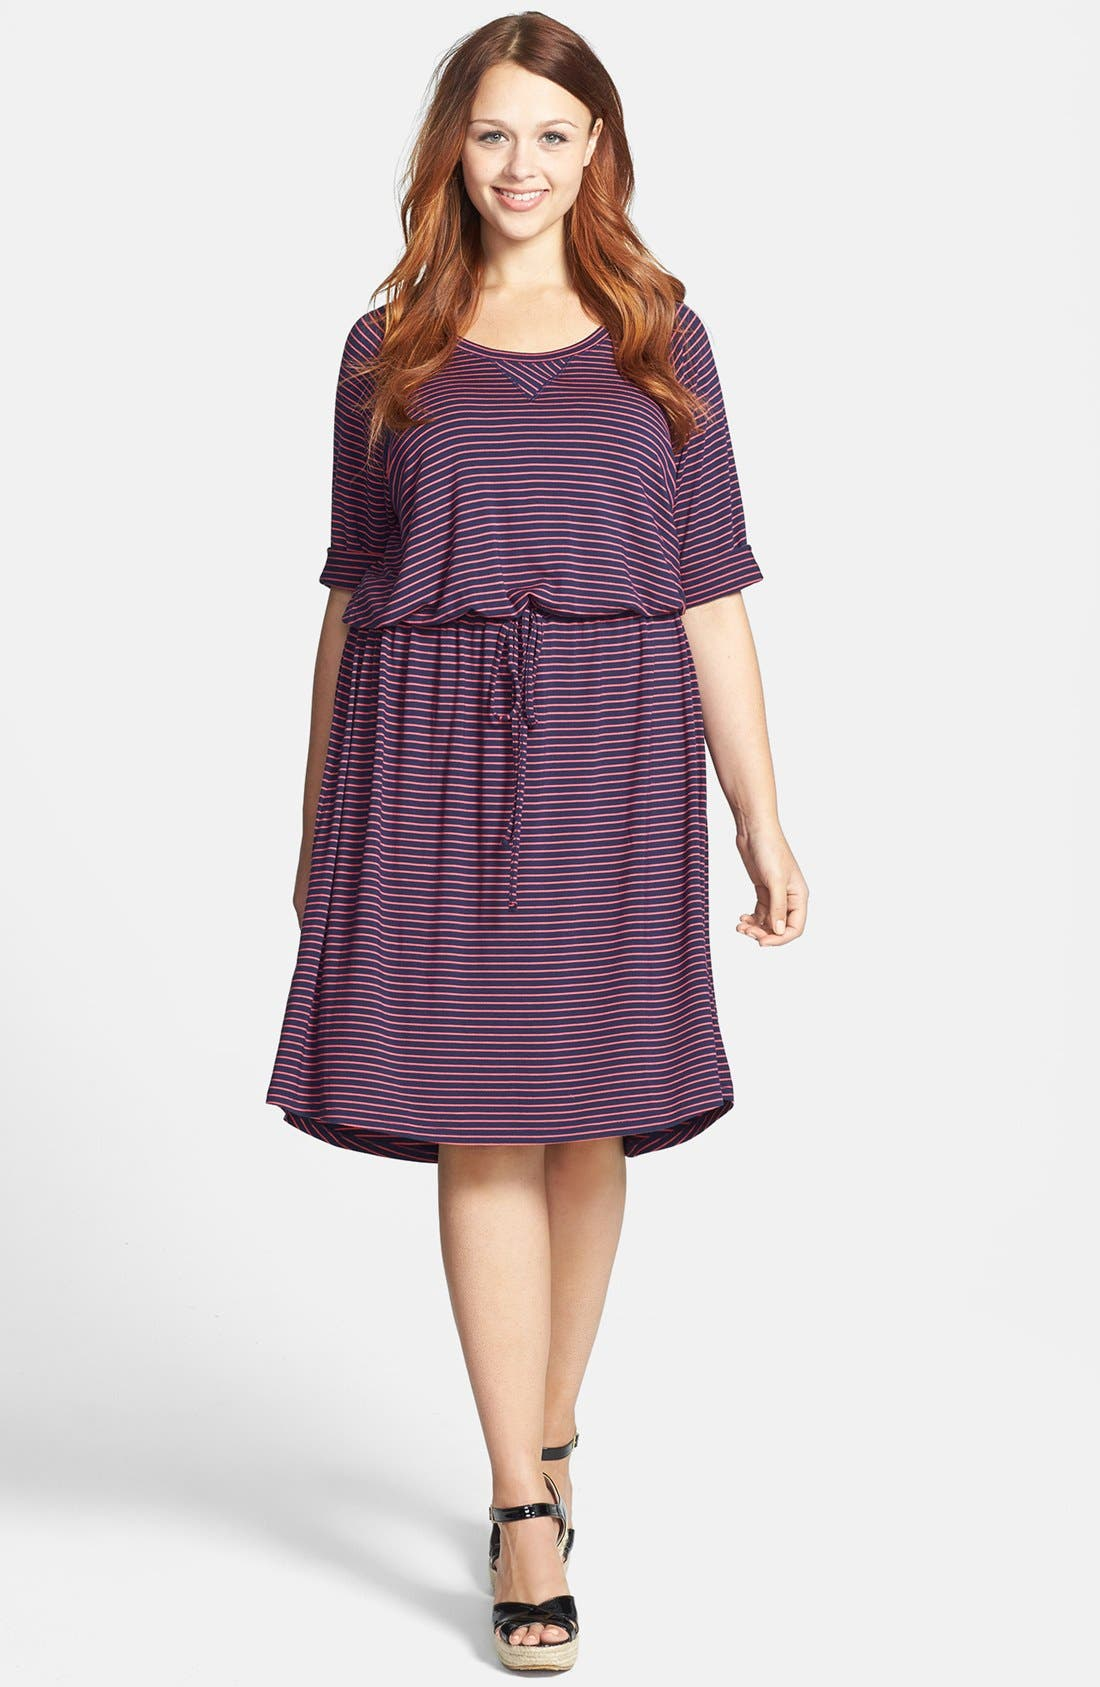 Alternate Image 1 Selected - Caslon® Three Quarter Sleeve Knit Dress (Plus Size)